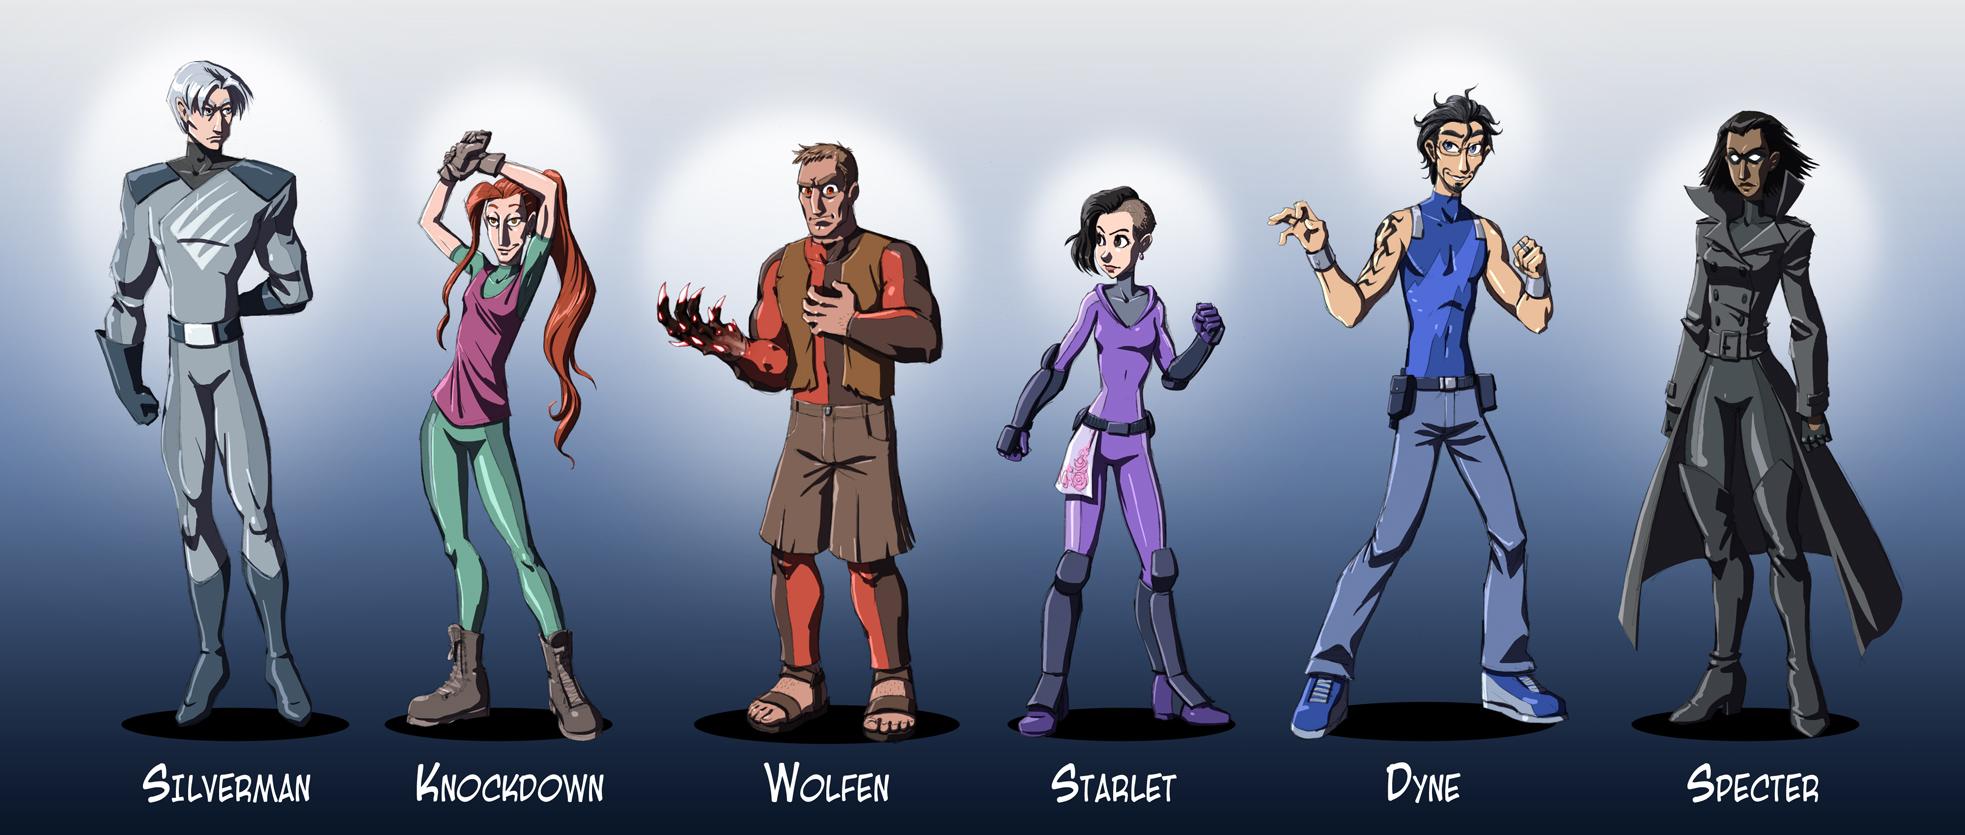 Heroes by falingard